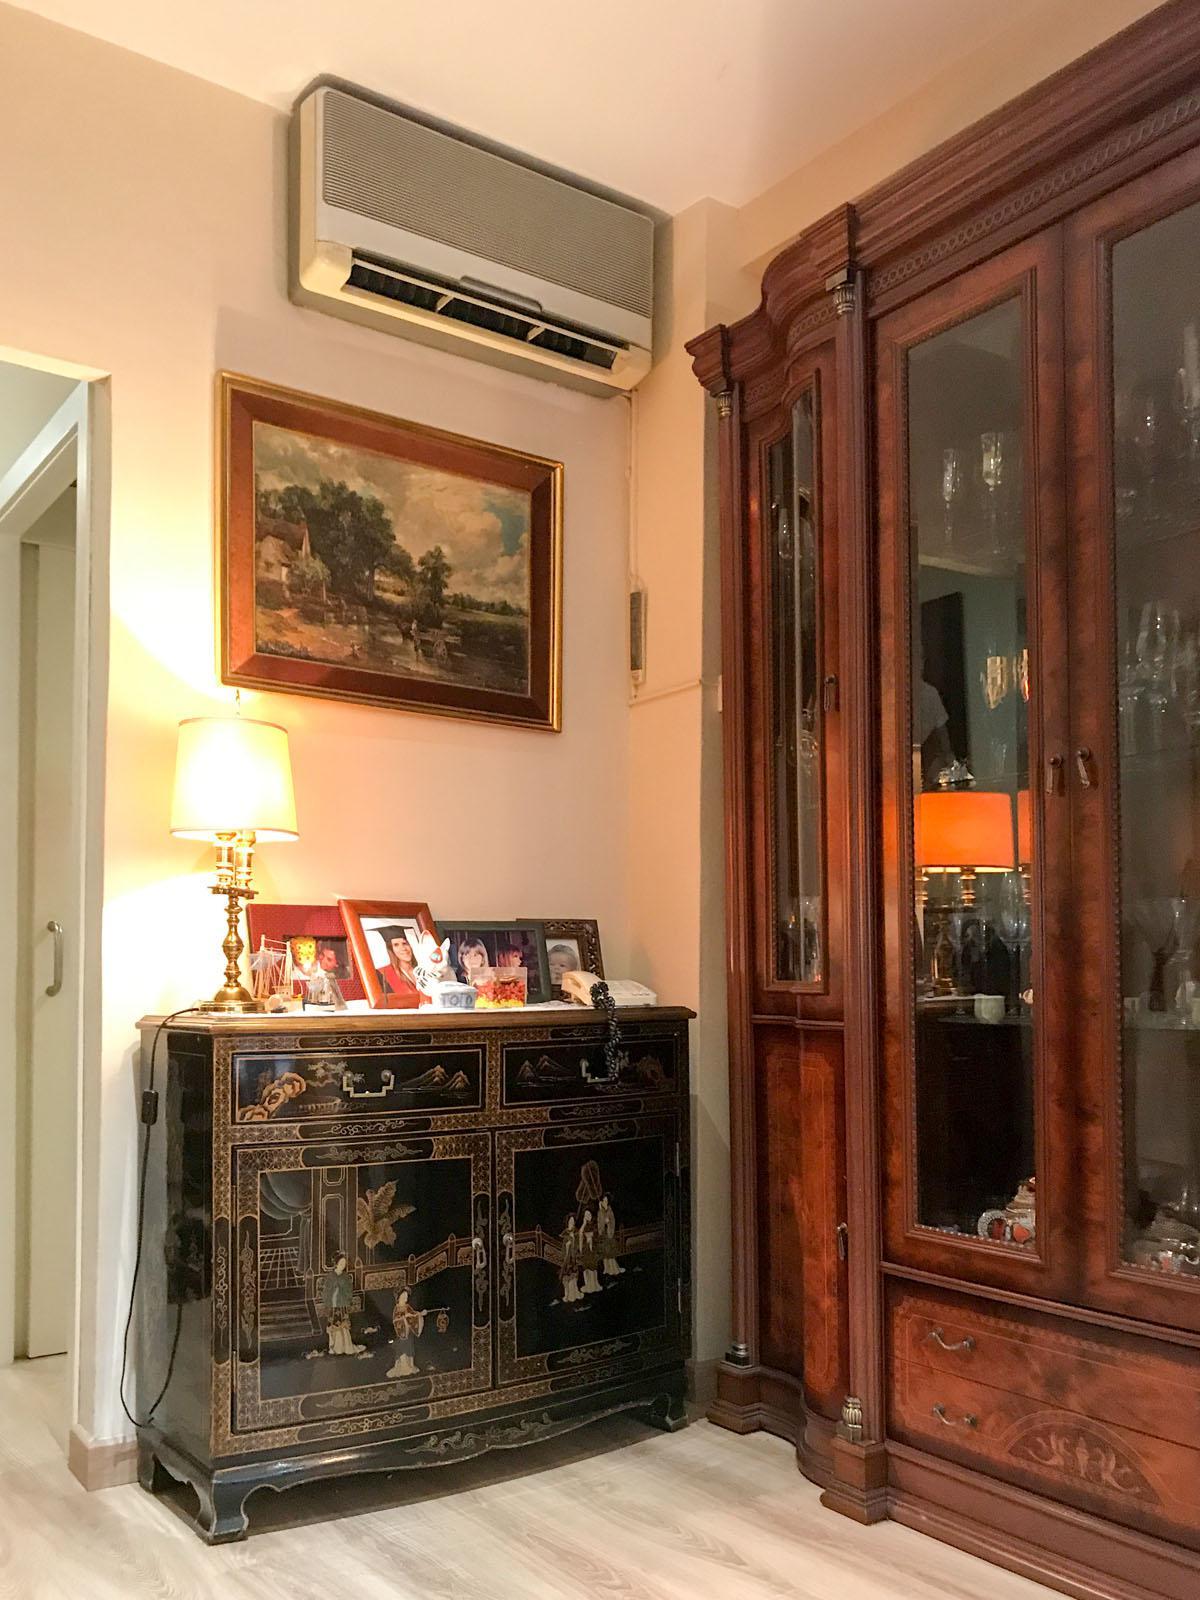 199044 Piso en venda en Sarrià-Sant Gervasi, Sant Gervasi-Galvany 14